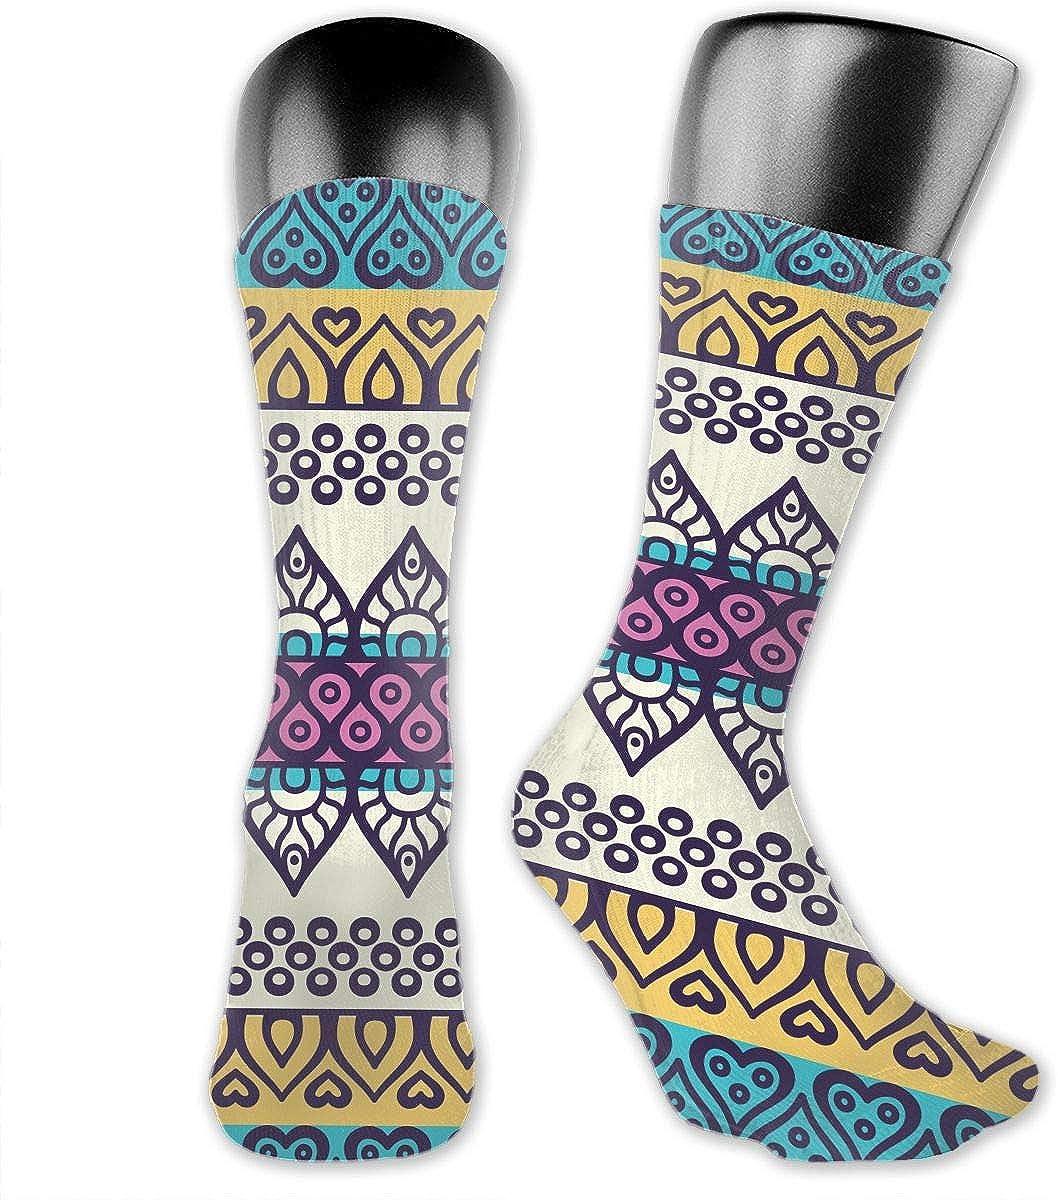 Geometric Fringes Symmetric Cotton Casual Colorful Fun Below Knee High Athletic Socks